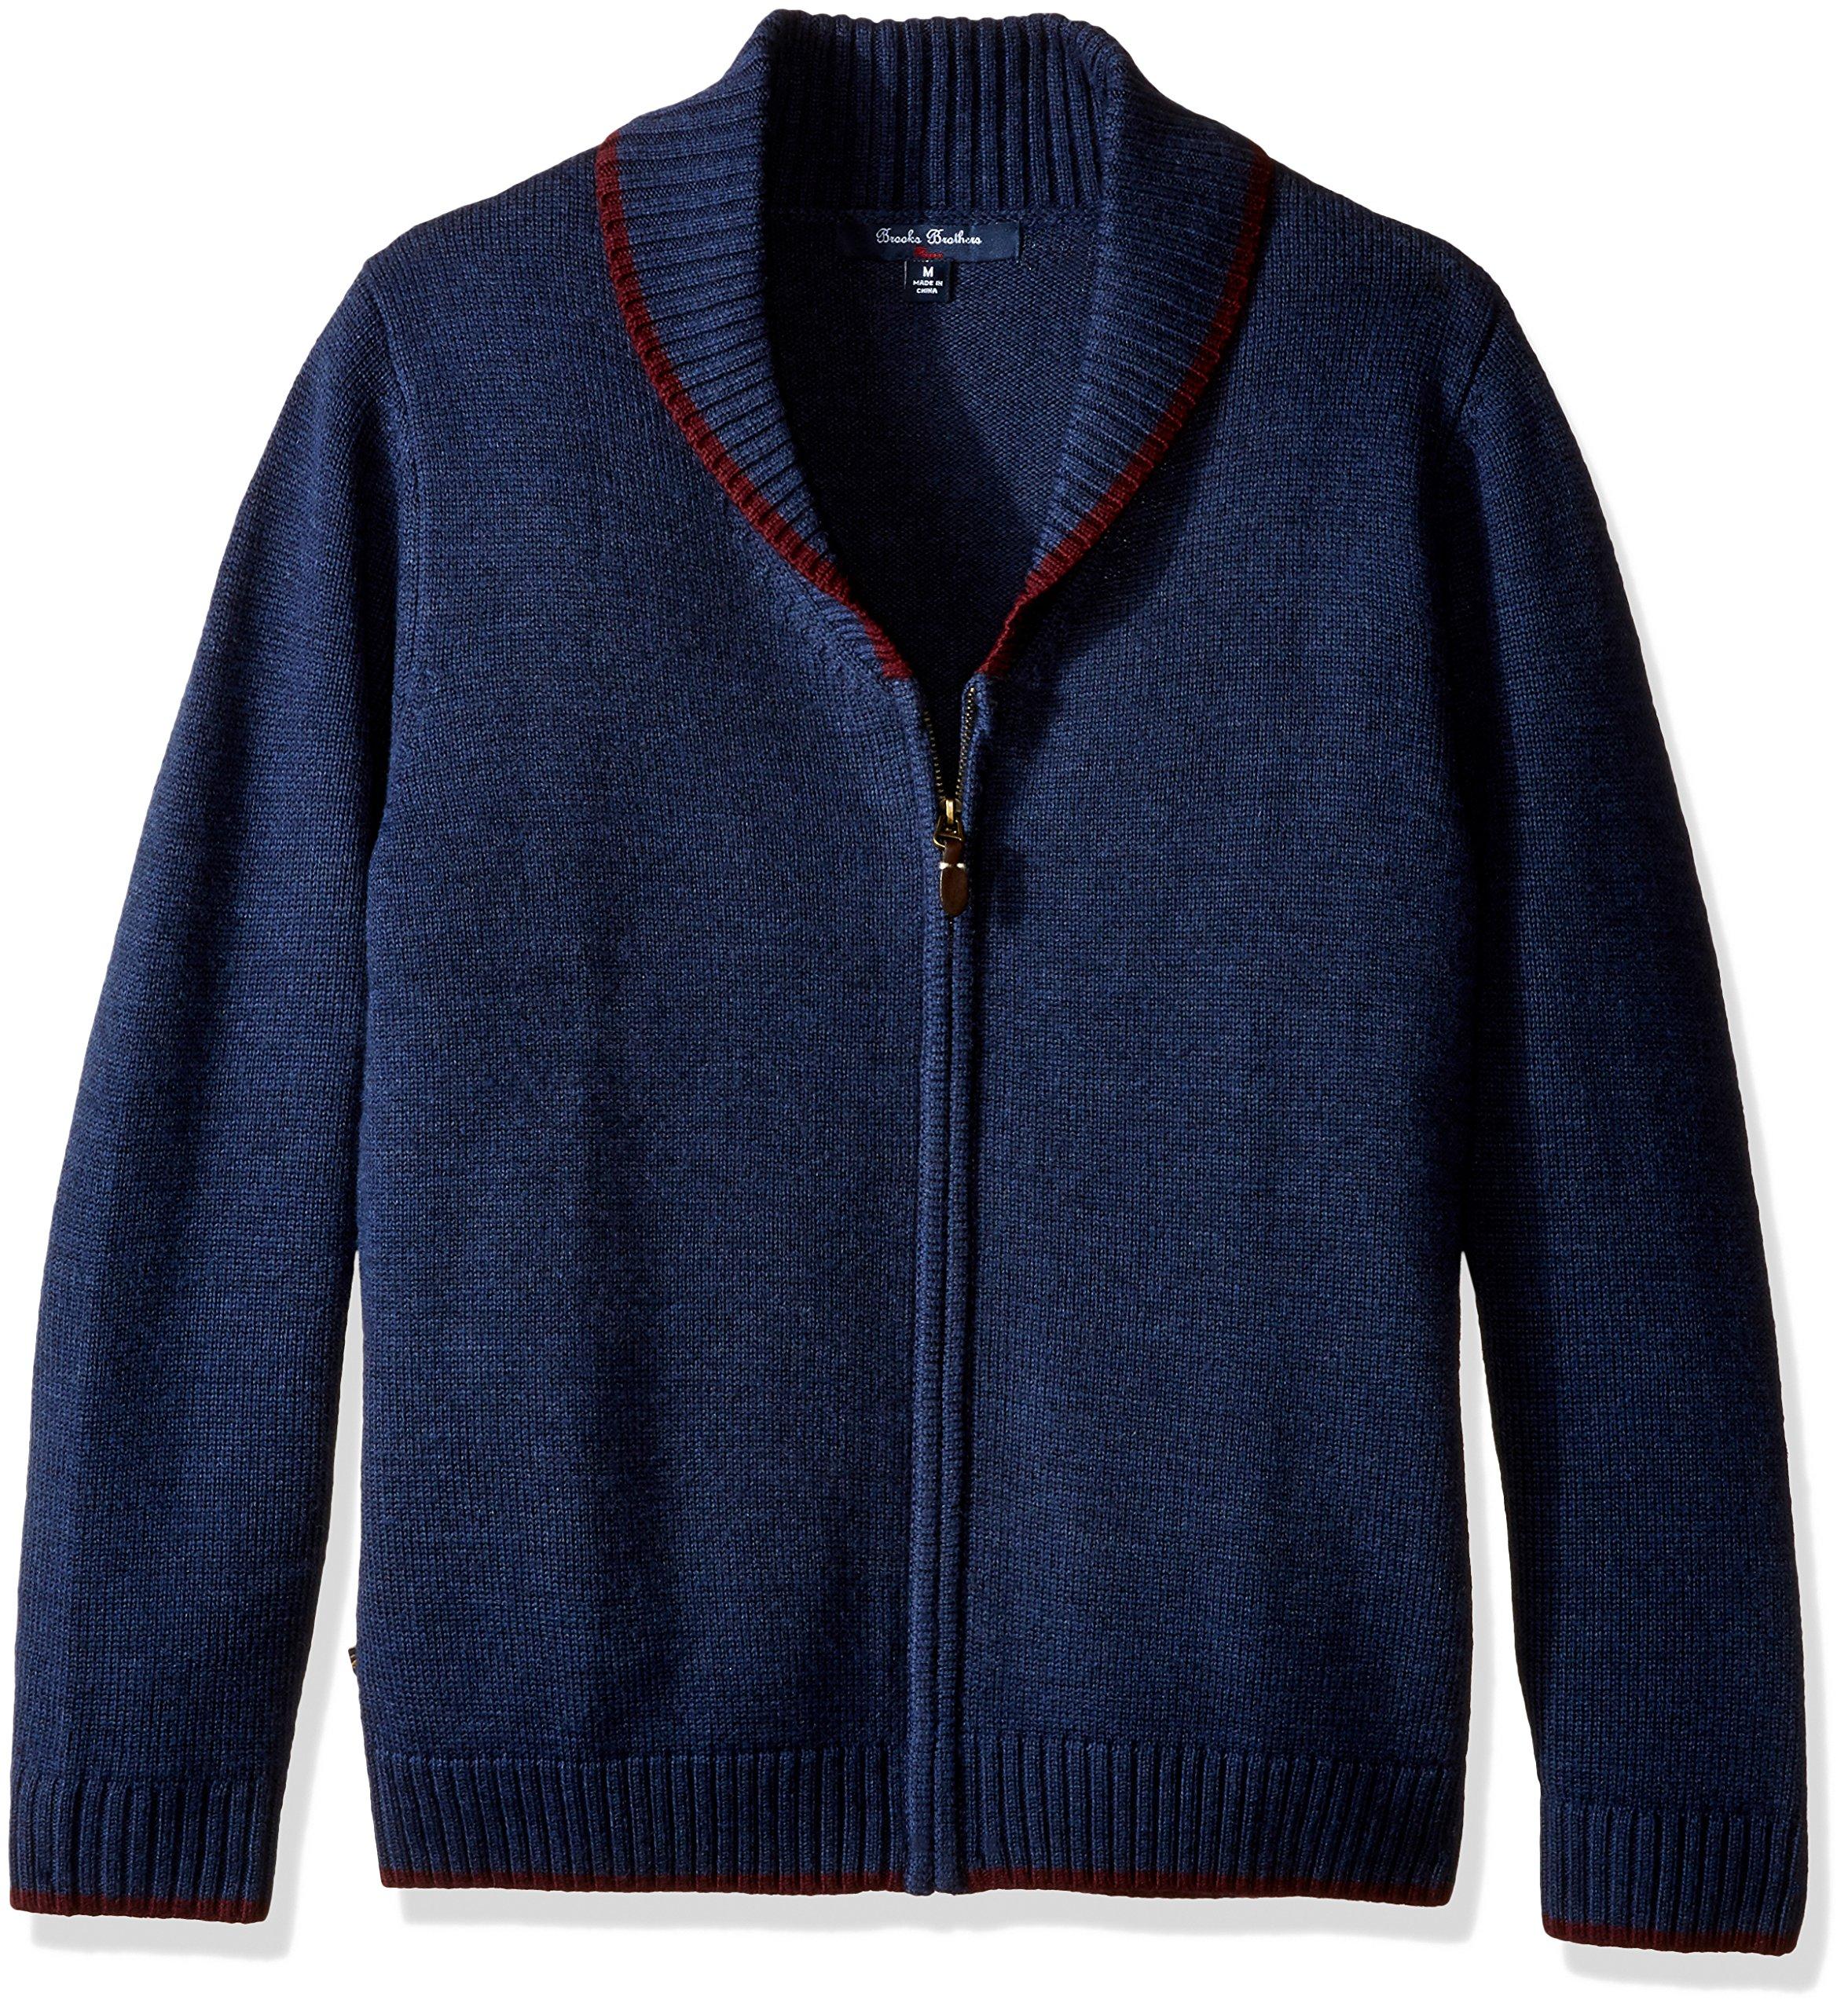 Brooks Brothers Little Boys' Shawl Collar Full Zip, Navy, s